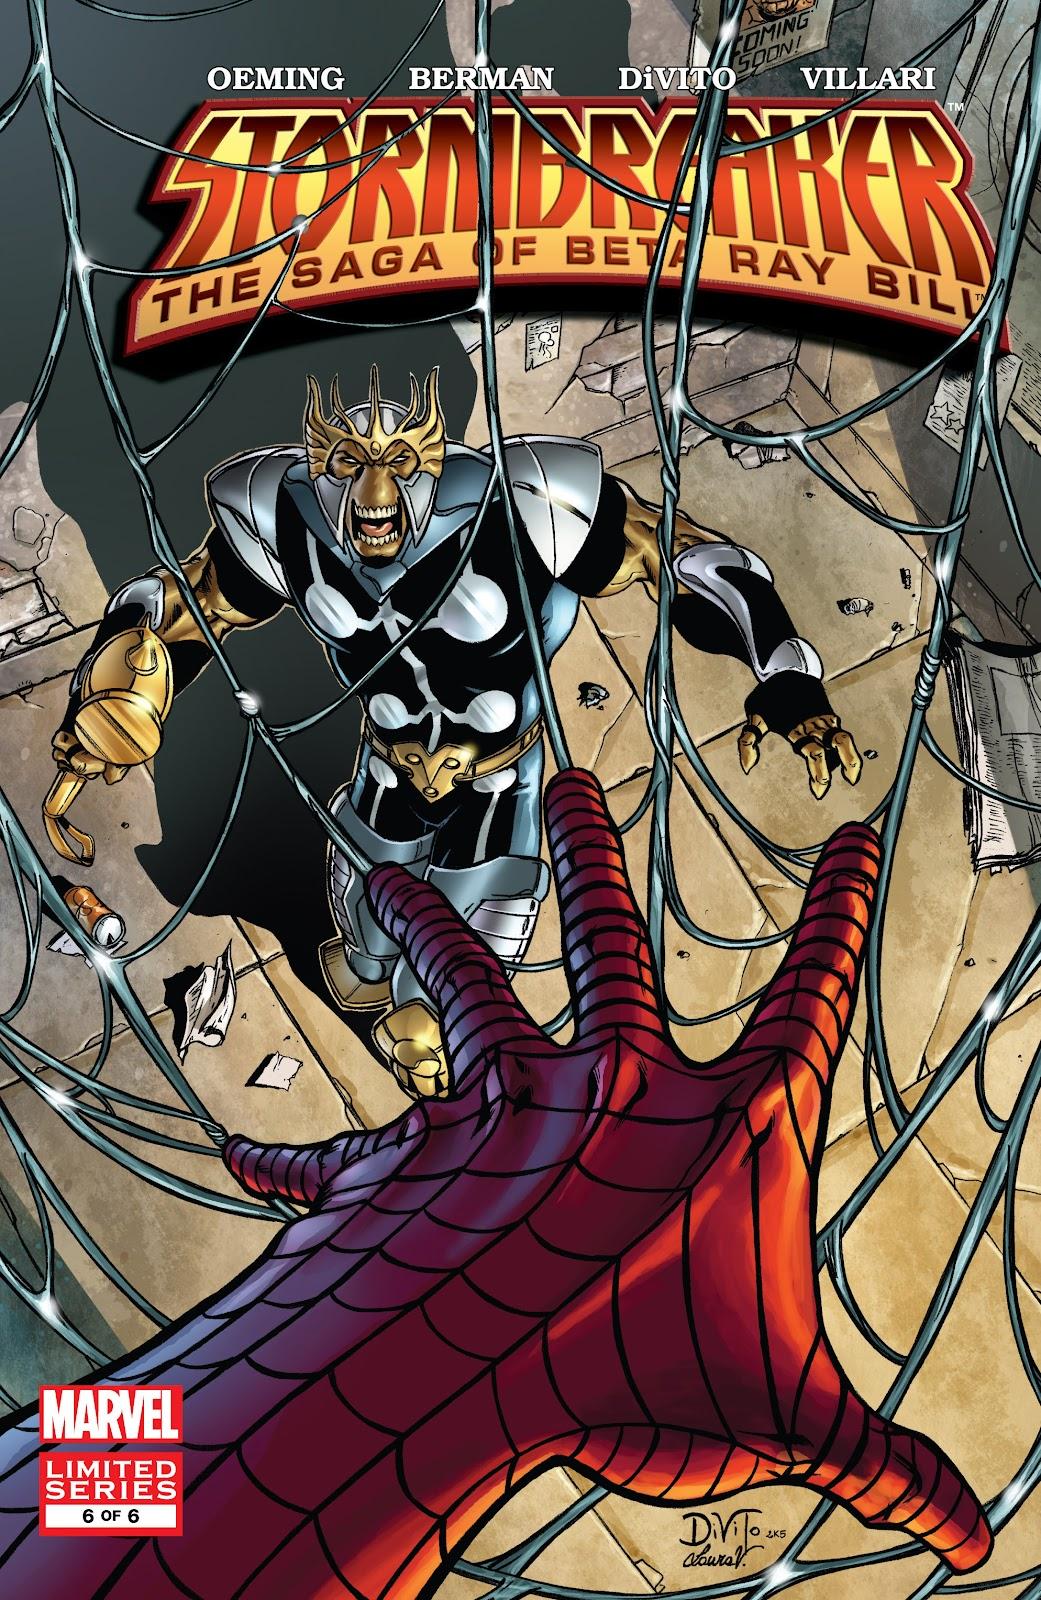 Read online Thor: Ragnaroks comic -  Issue # TPB (Part 4) - 65